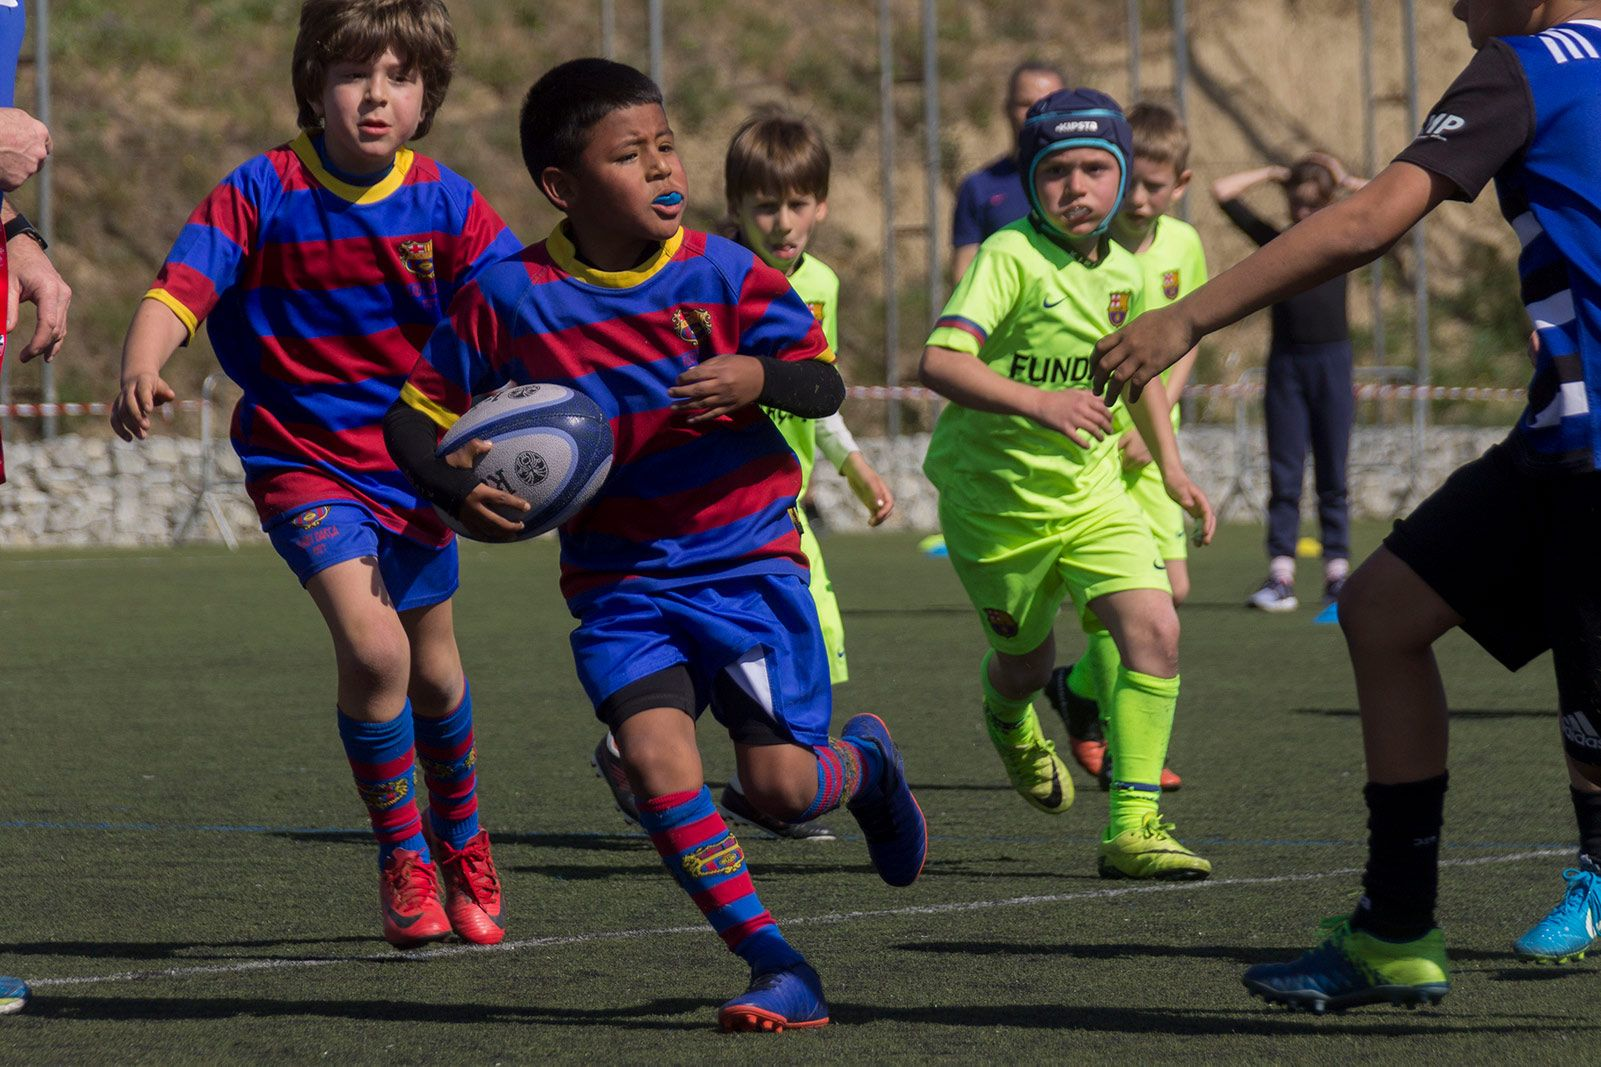 Torneig Jon Reca de rugby. FOTO: Paula Galván